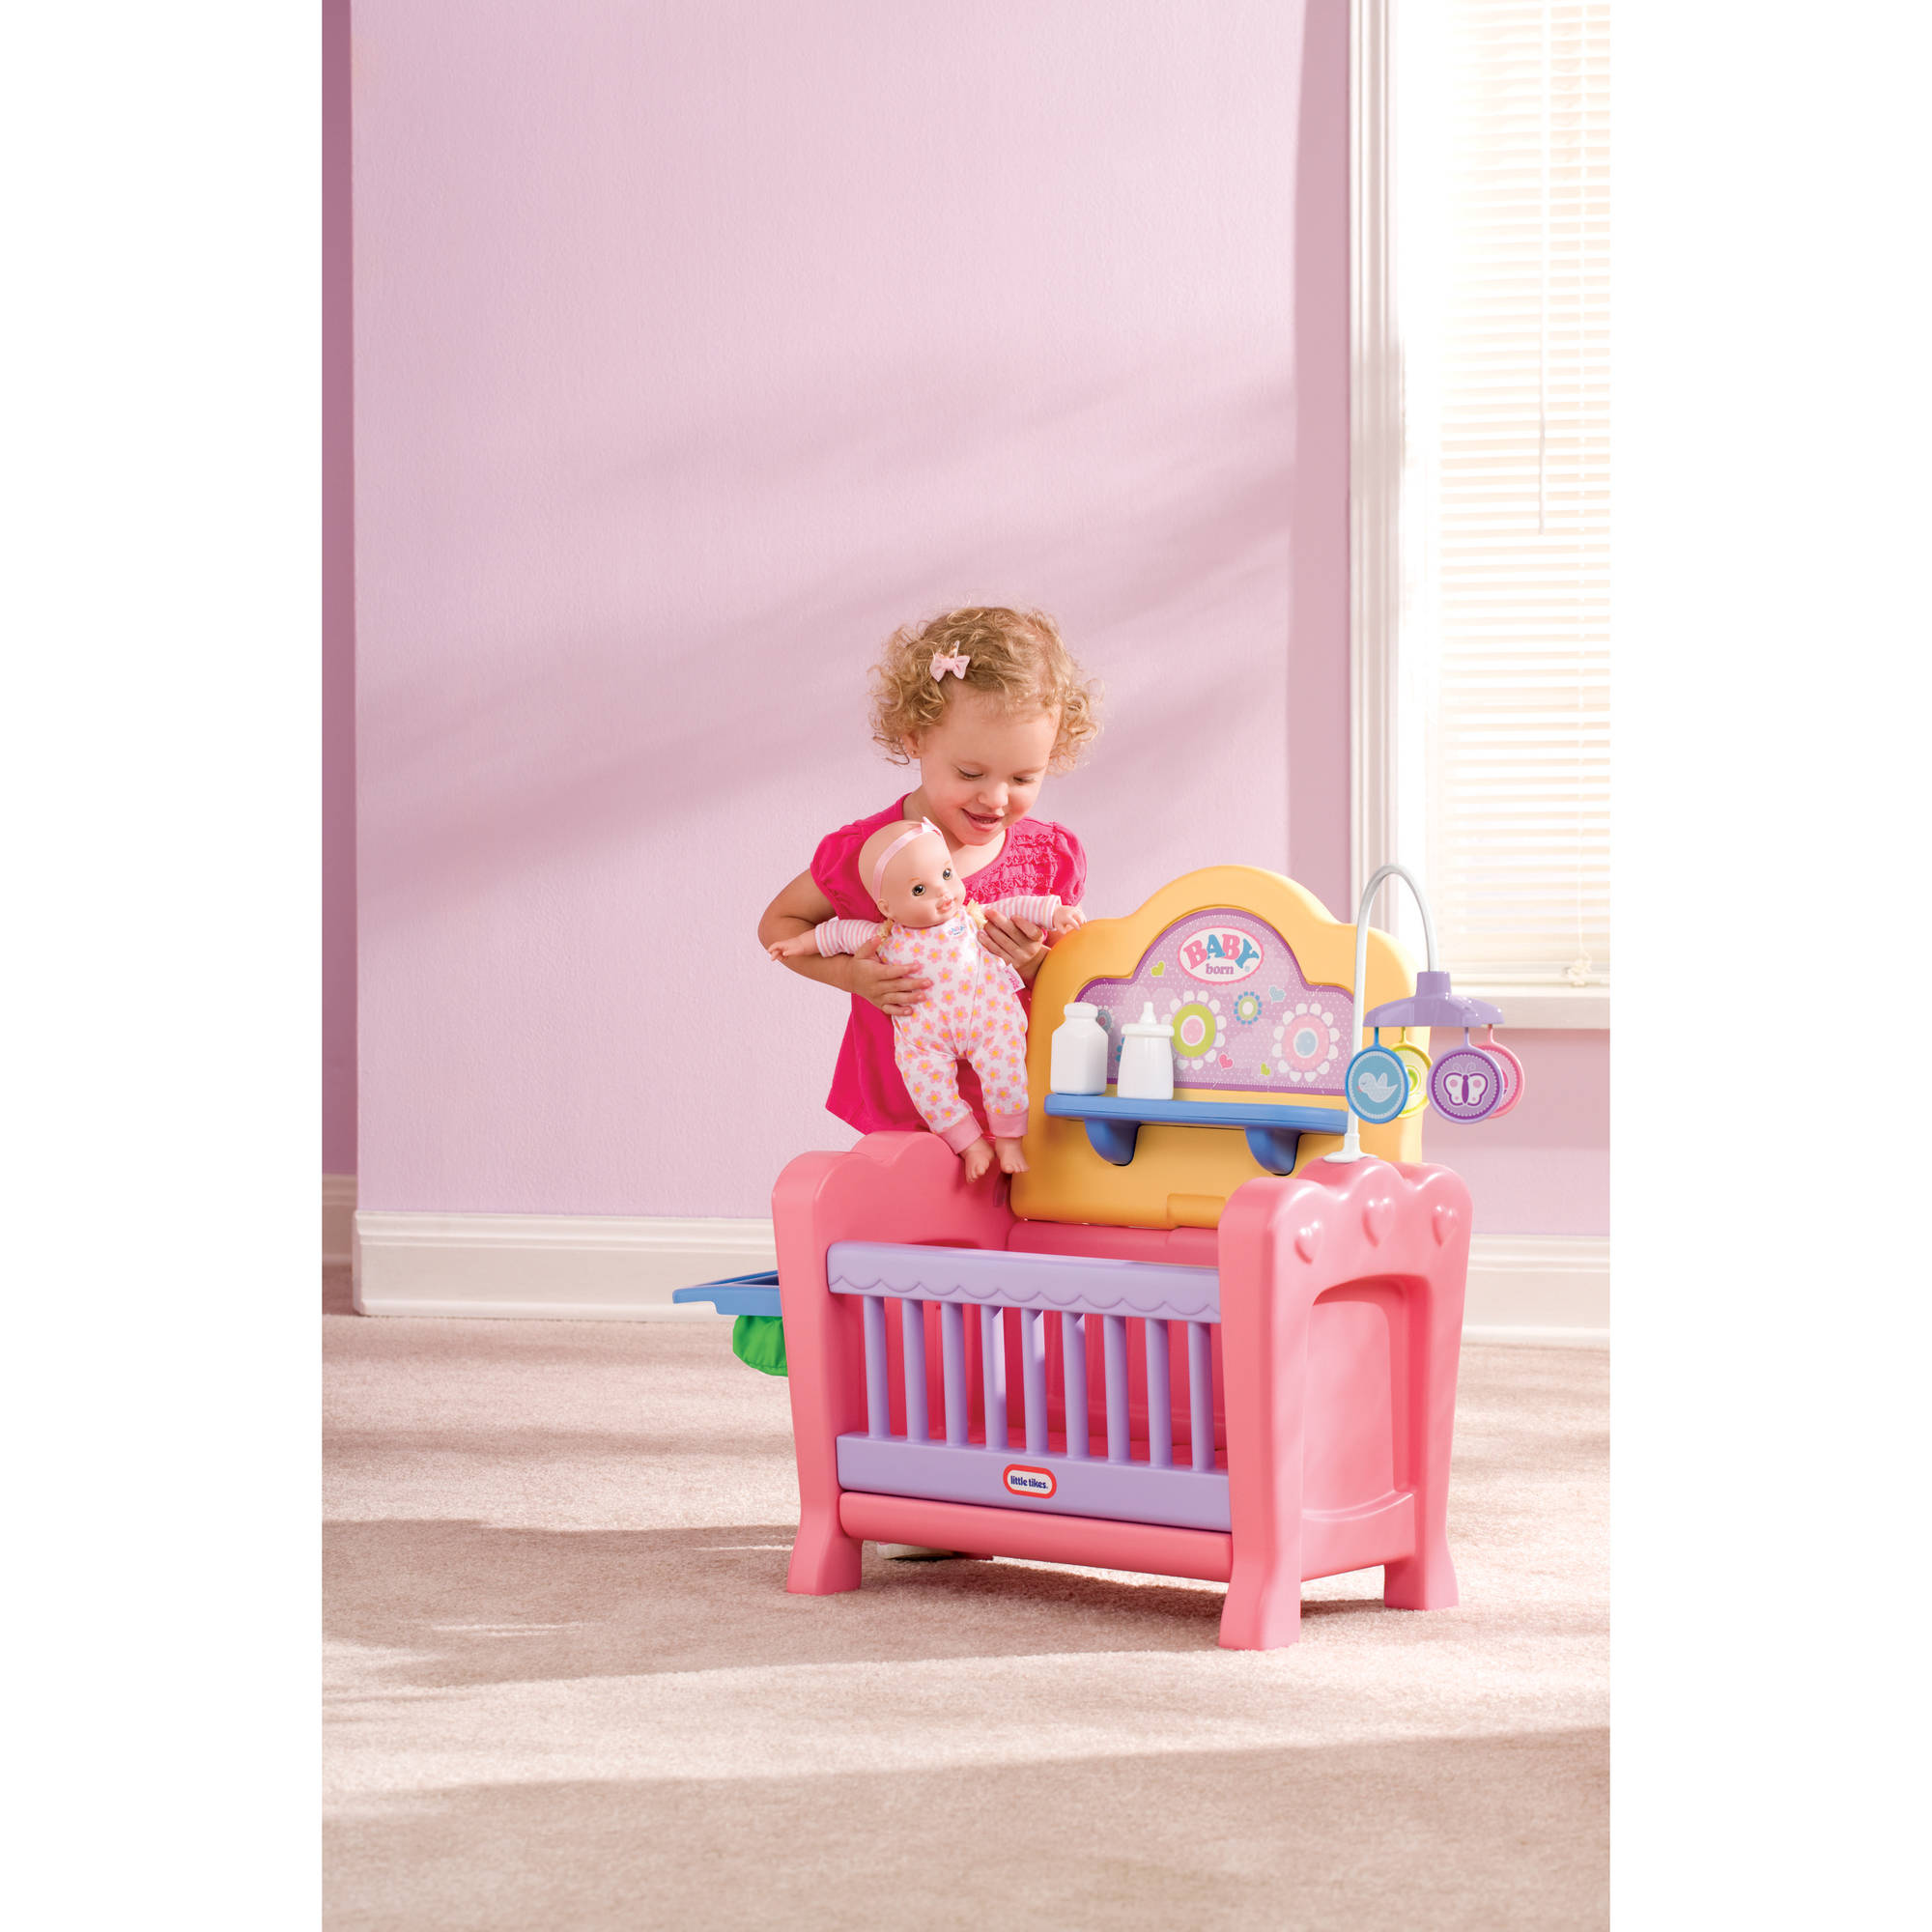 Little Tikes 4-in-1 Baby Born Nursery Play Set